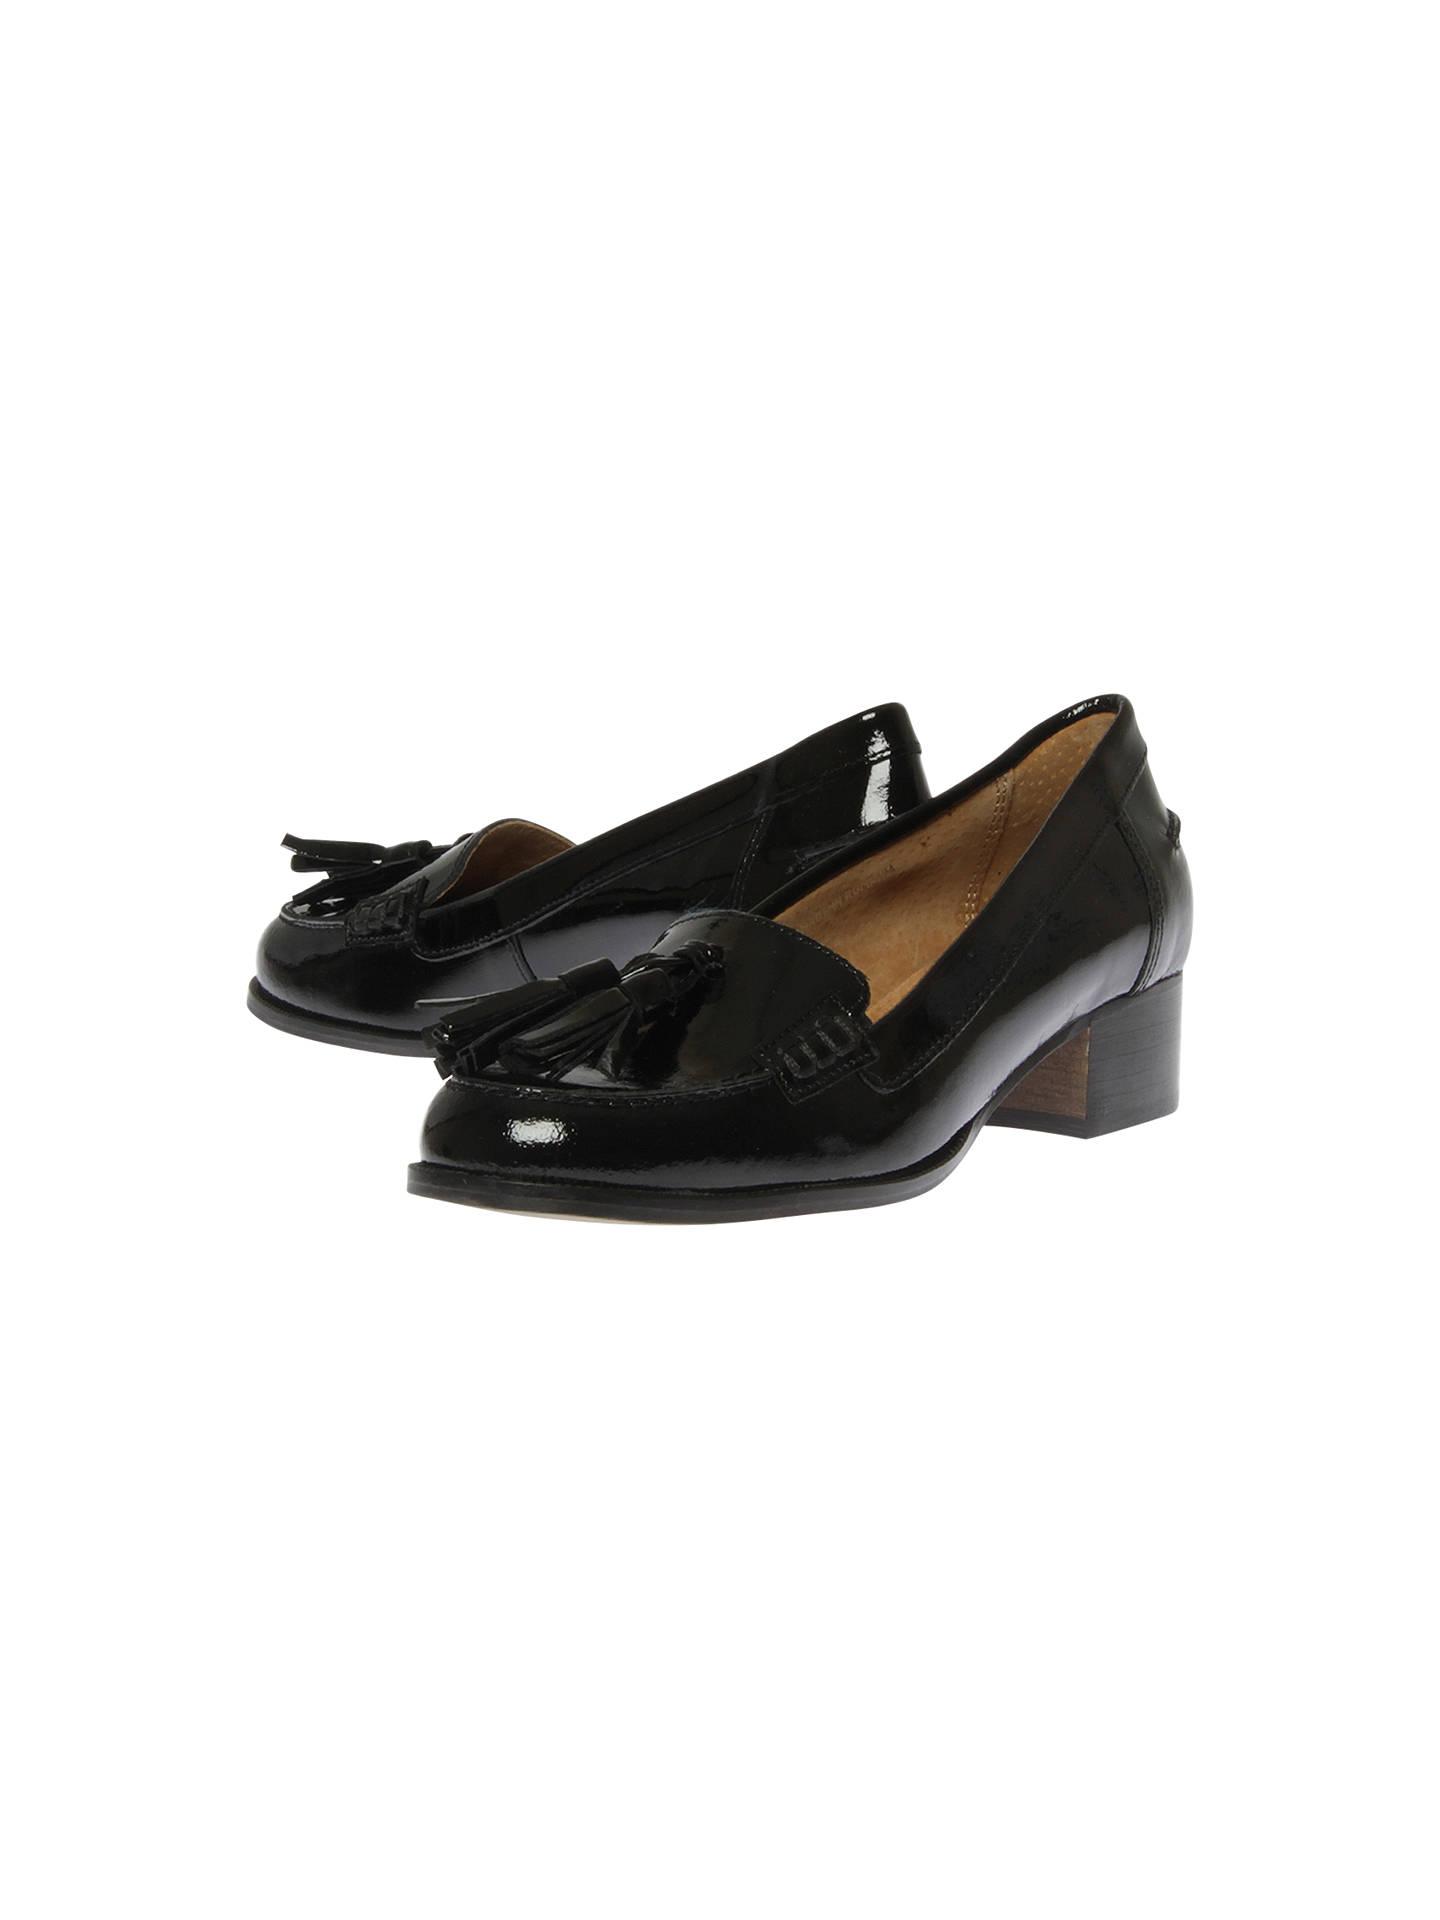 7fc5c6091e4 ... Buy Carvela Lexie Tassel Patent Leather Block Heel Loafers